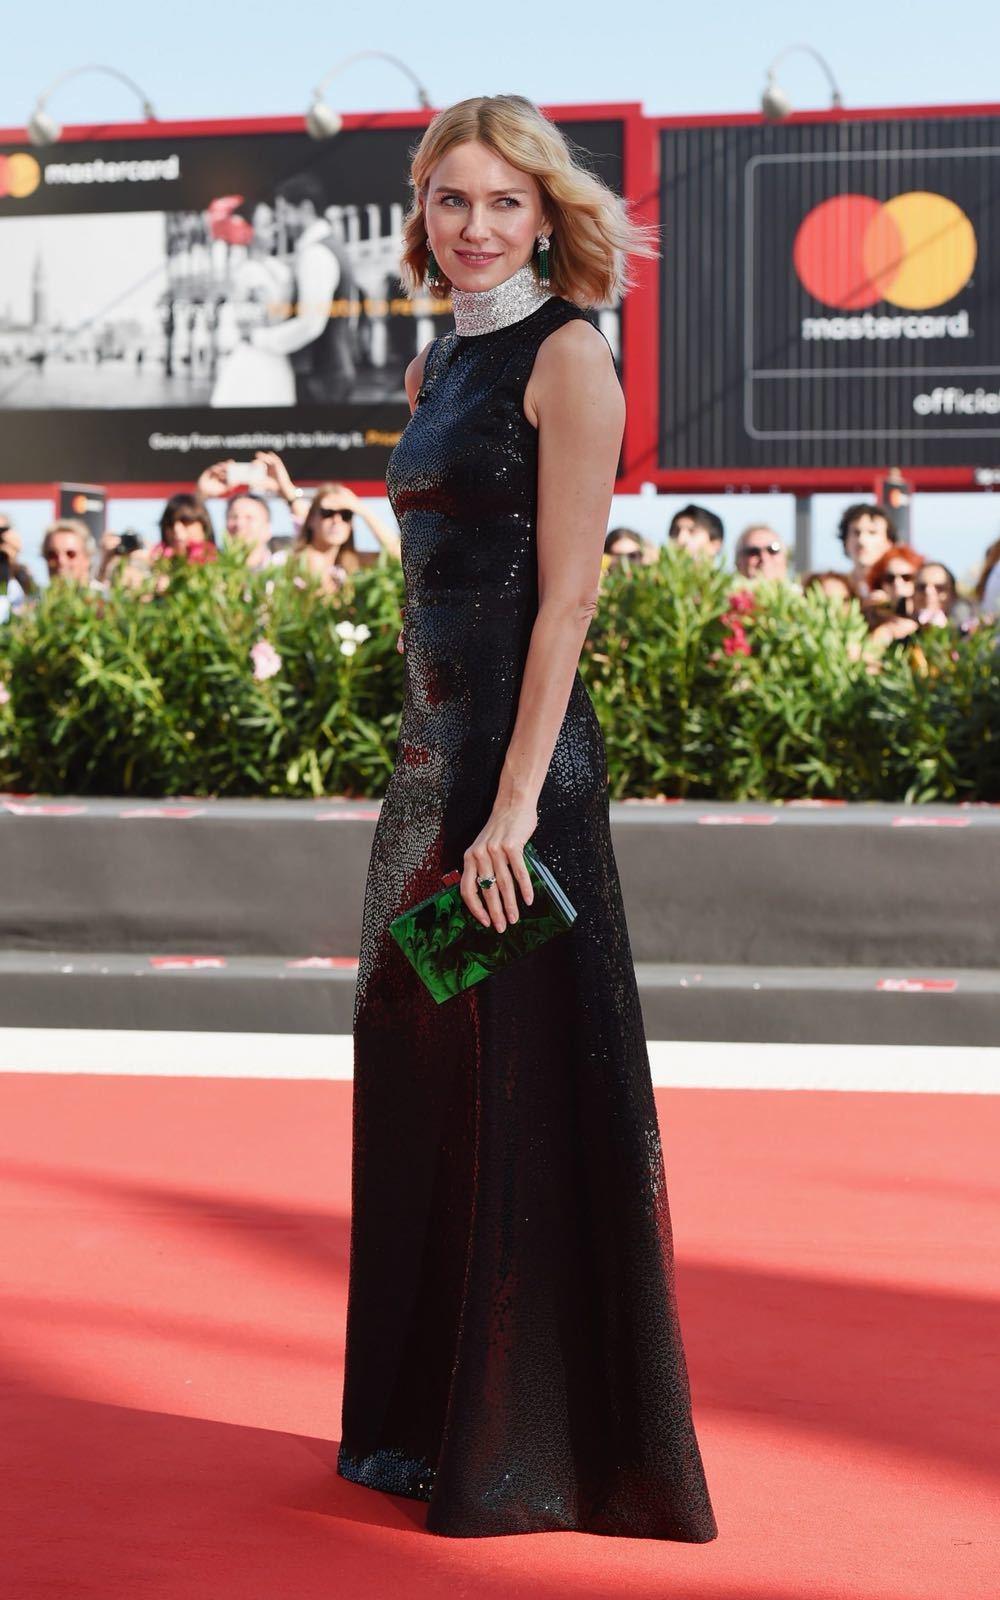 娜歐蜜華茲演繹MICHAEL KORS Collection系列訂製款黑色長禮服...